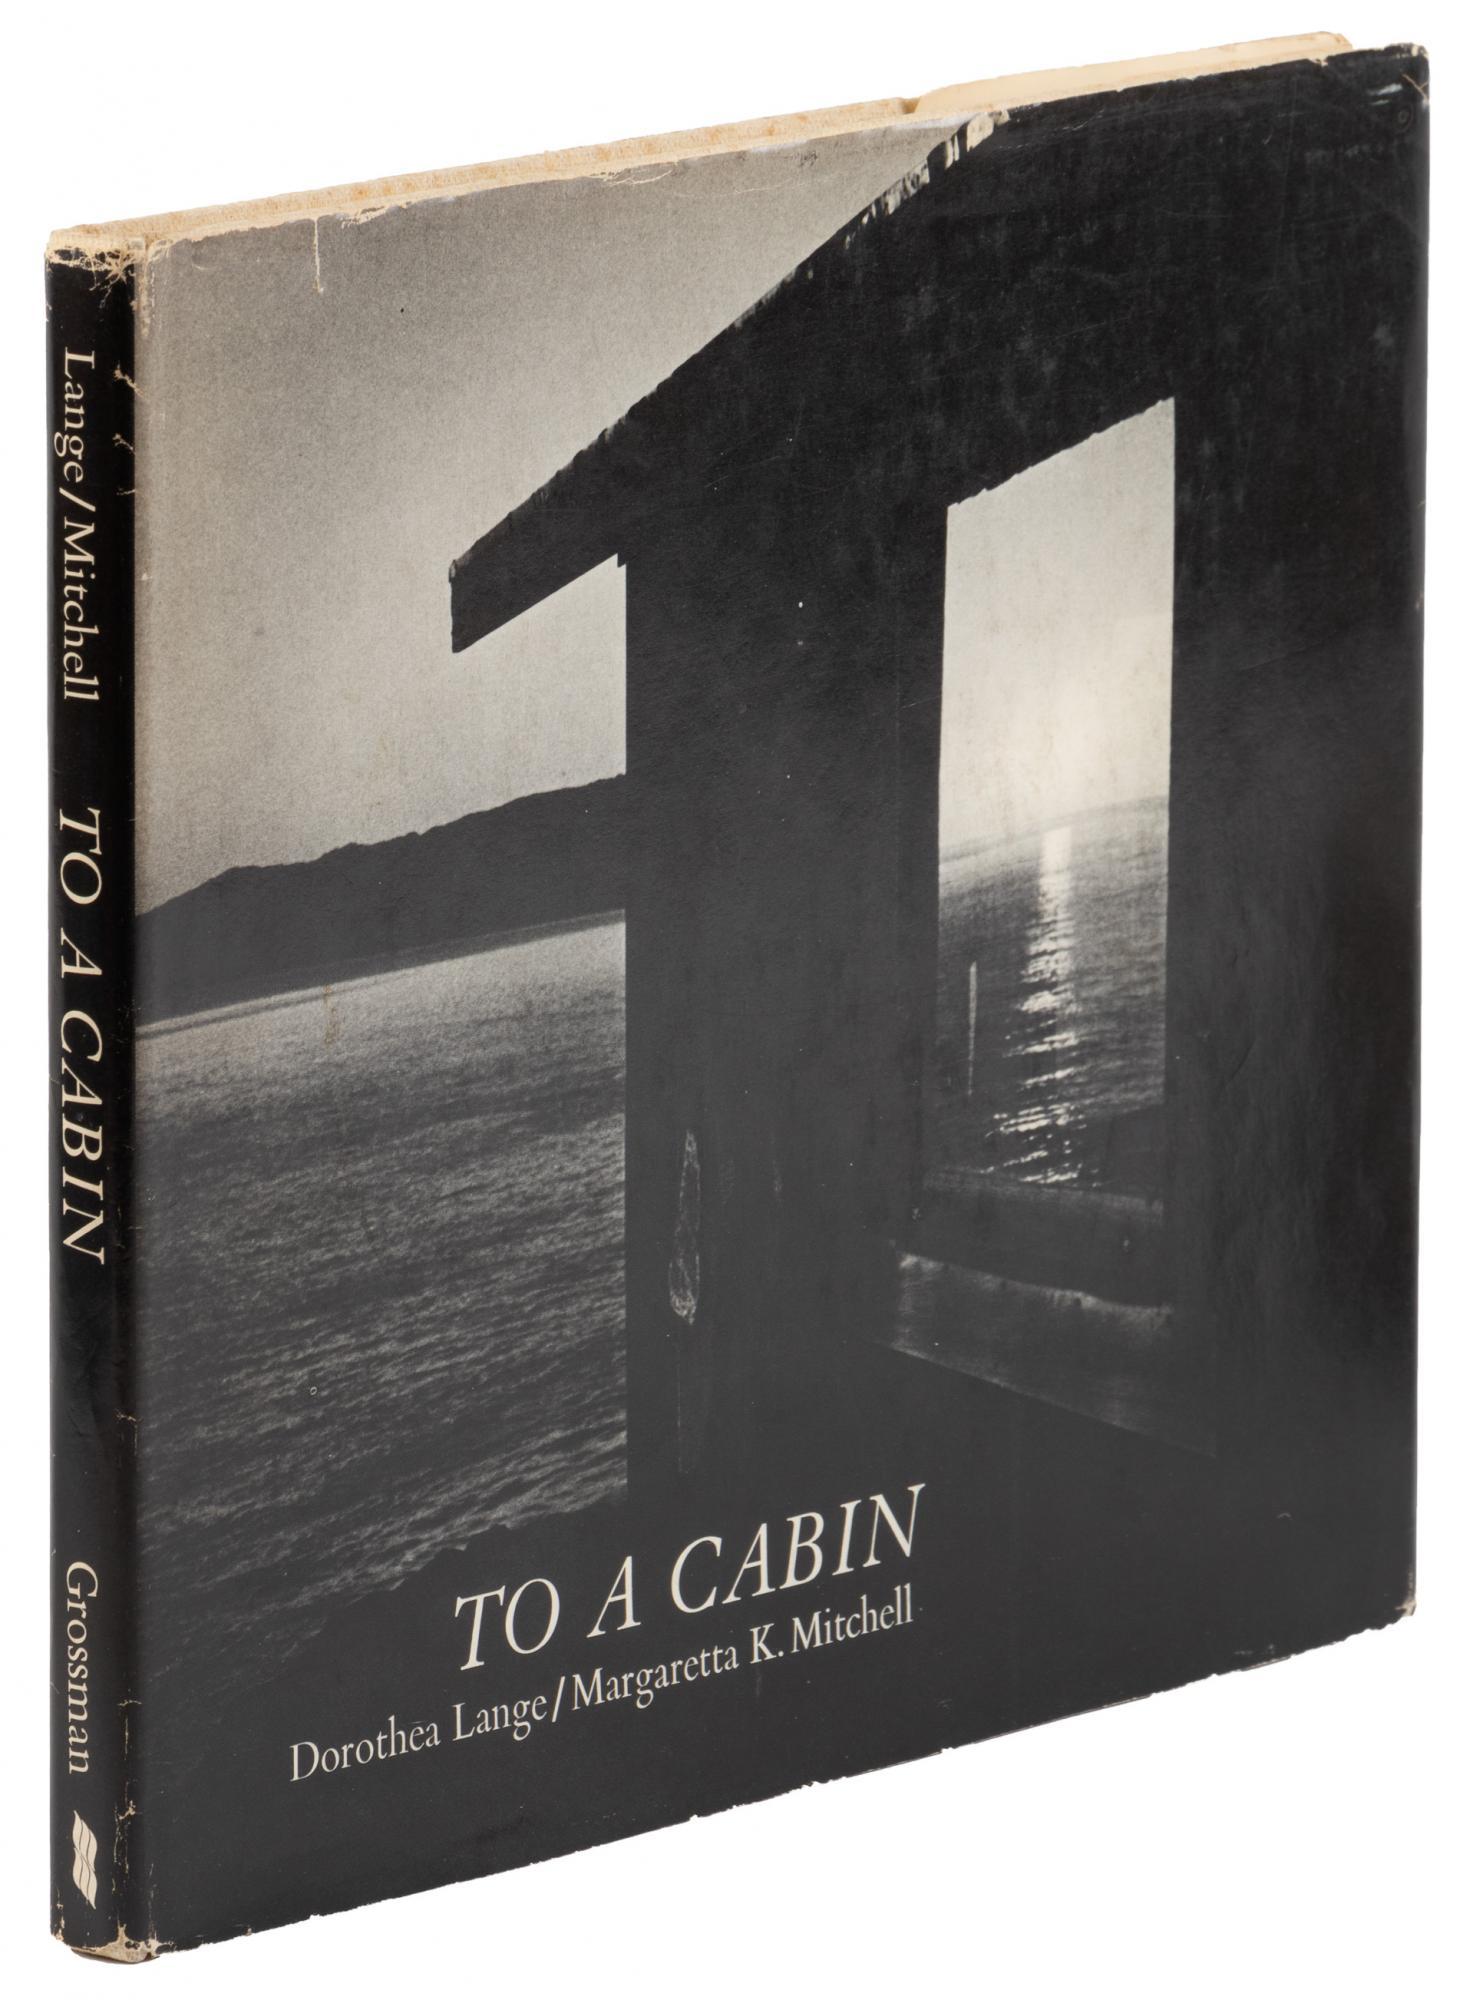 Dorothea Lange, To a Cabin in jacket